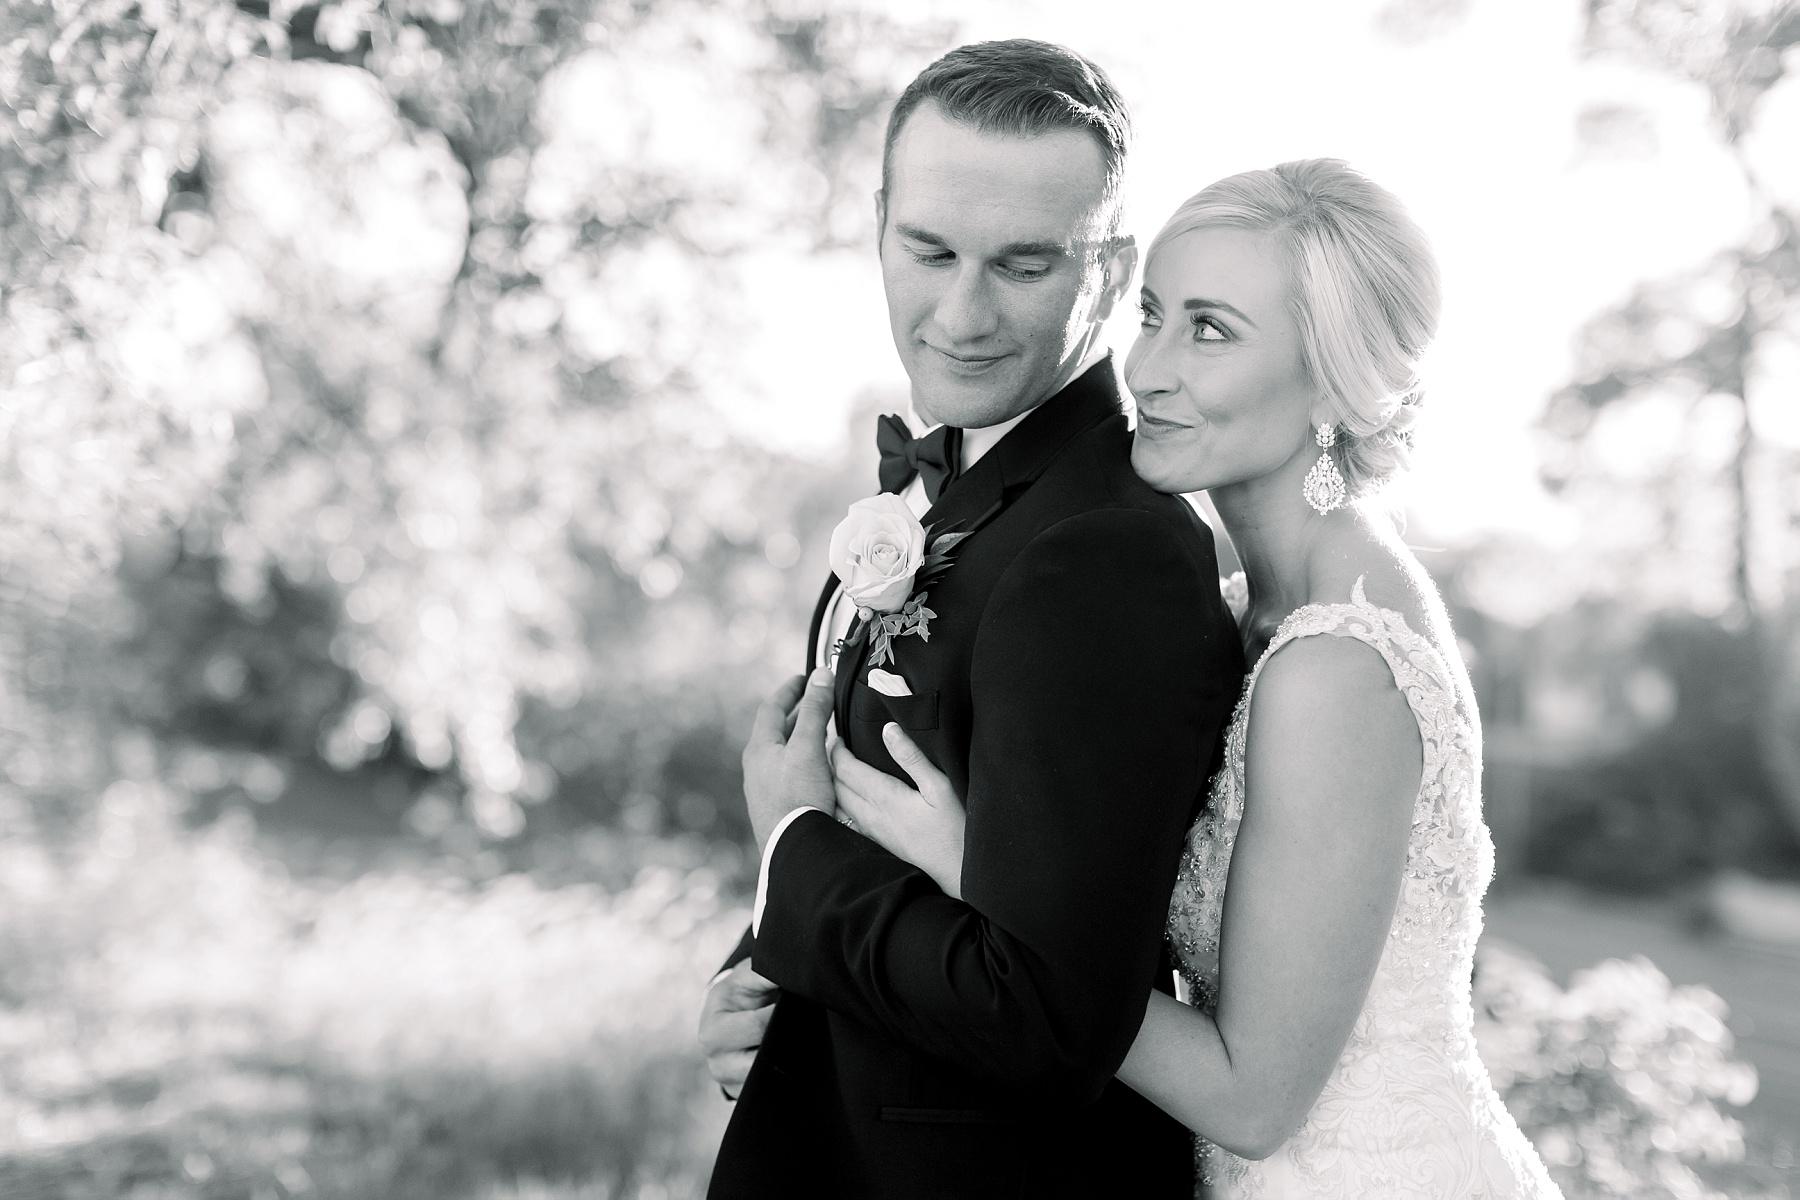 midwest-adventurous-wedding-photographer-elizabeth-ladean-photography-photo_4810.jpg